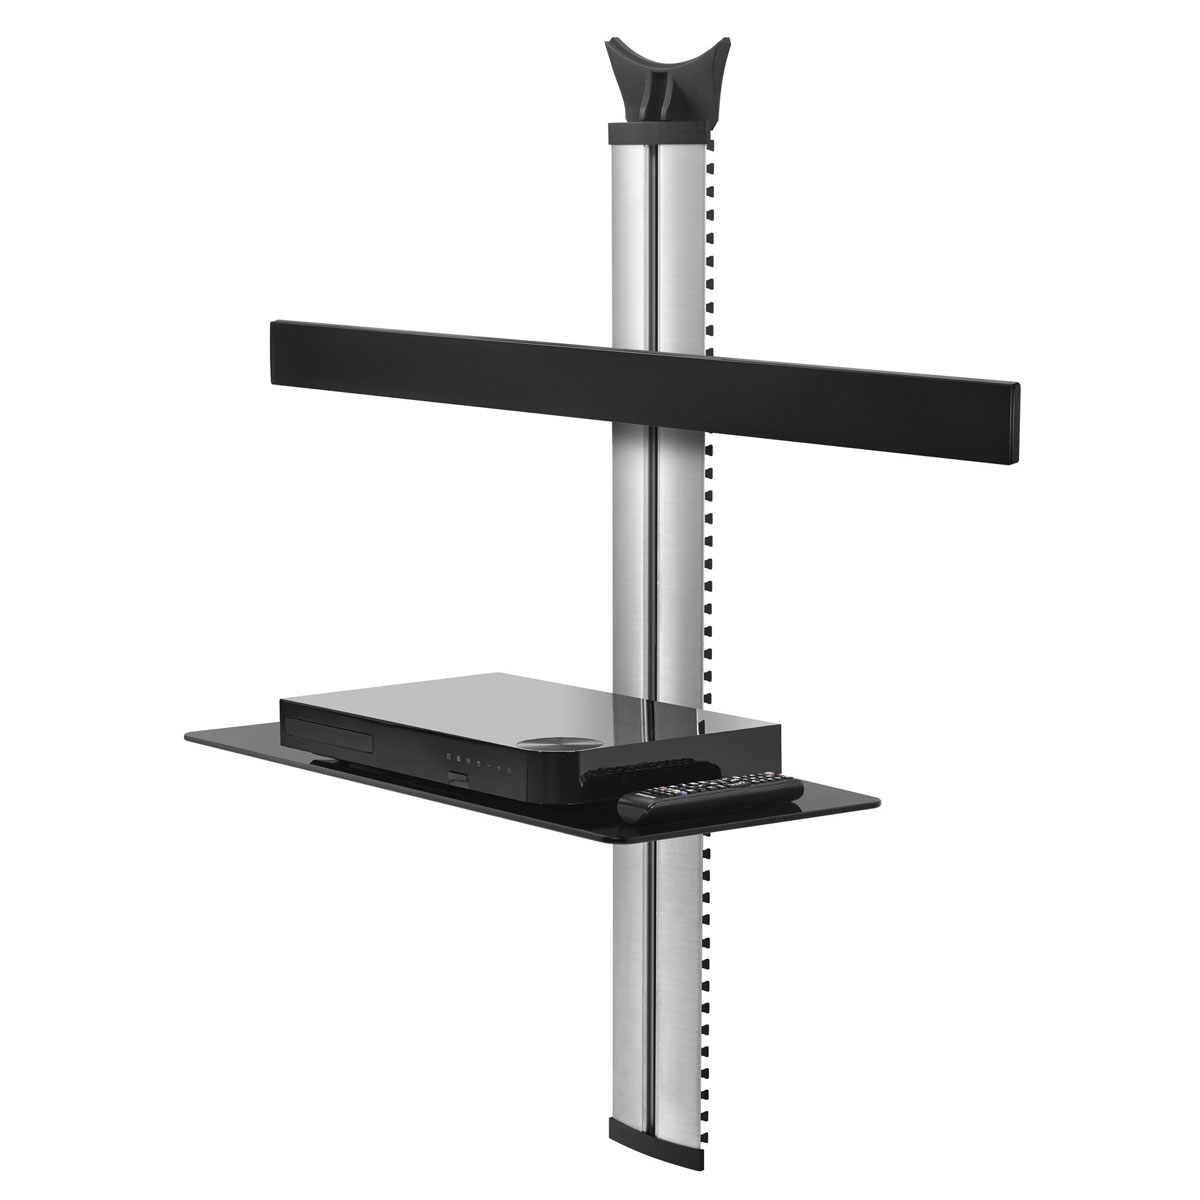 vogel 39 s sound 3400 sound 3400 achat vente pied support enceinte sur. Black Bedroom Furniture Sets. Home Design Ideas